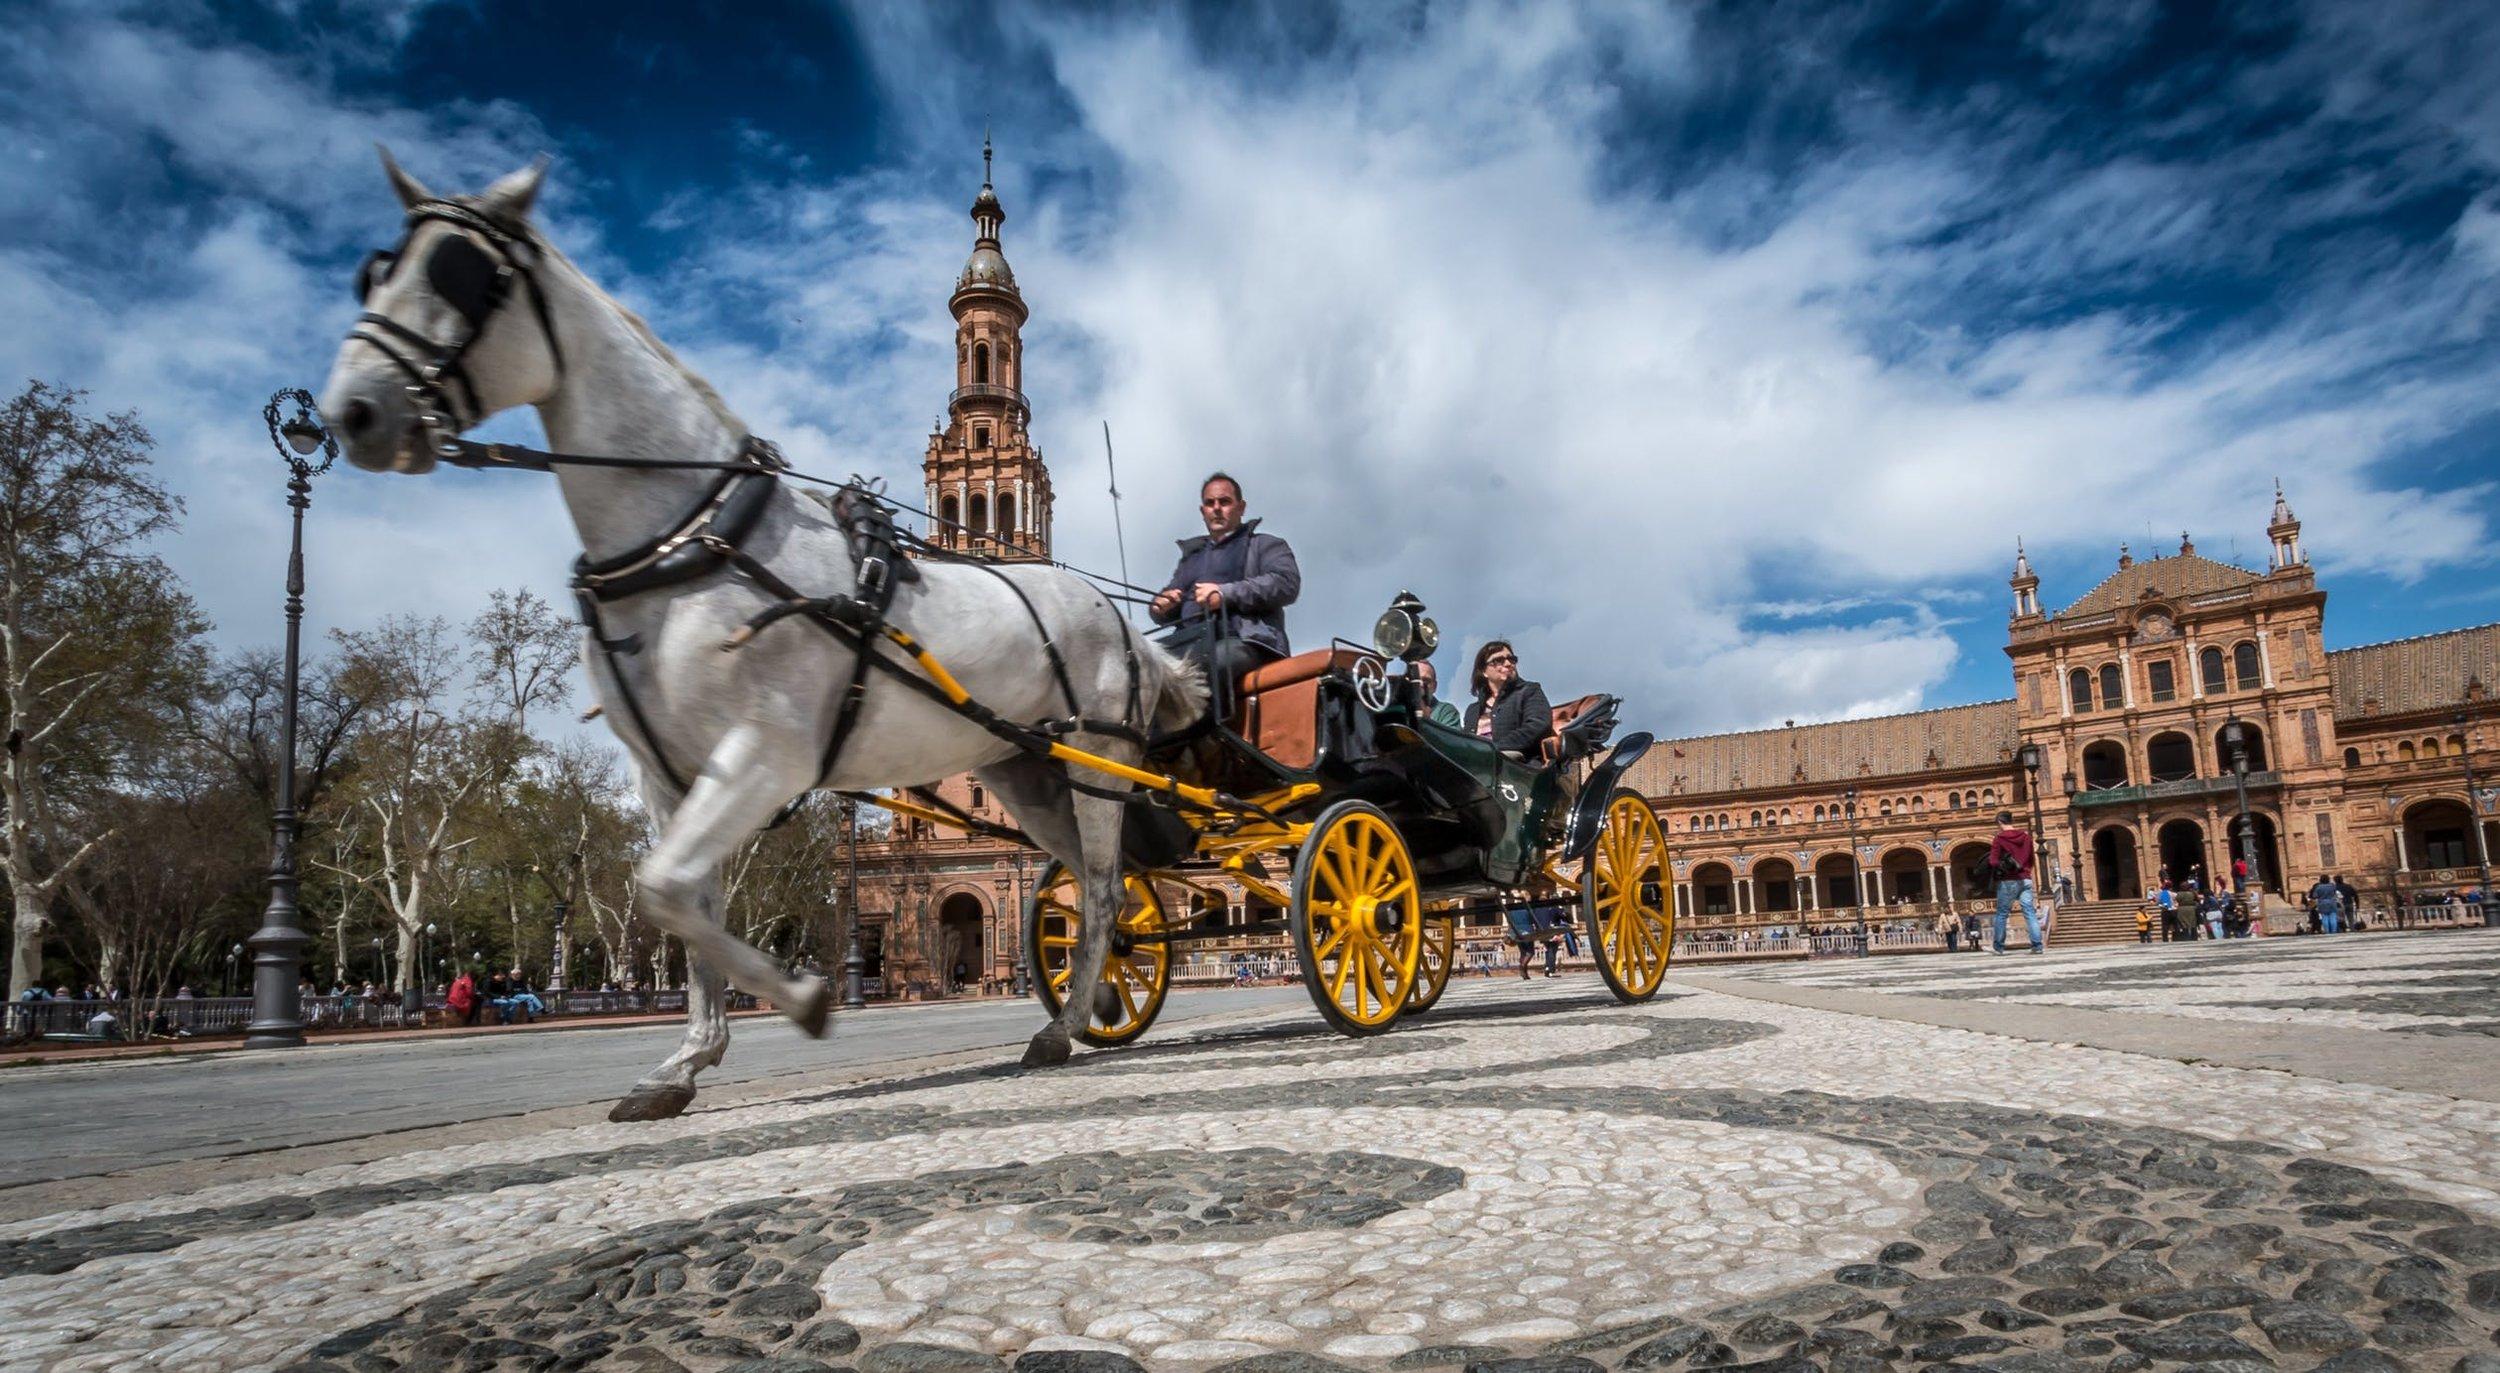 sevilla-horse-spain-tourism-162042.jpeg